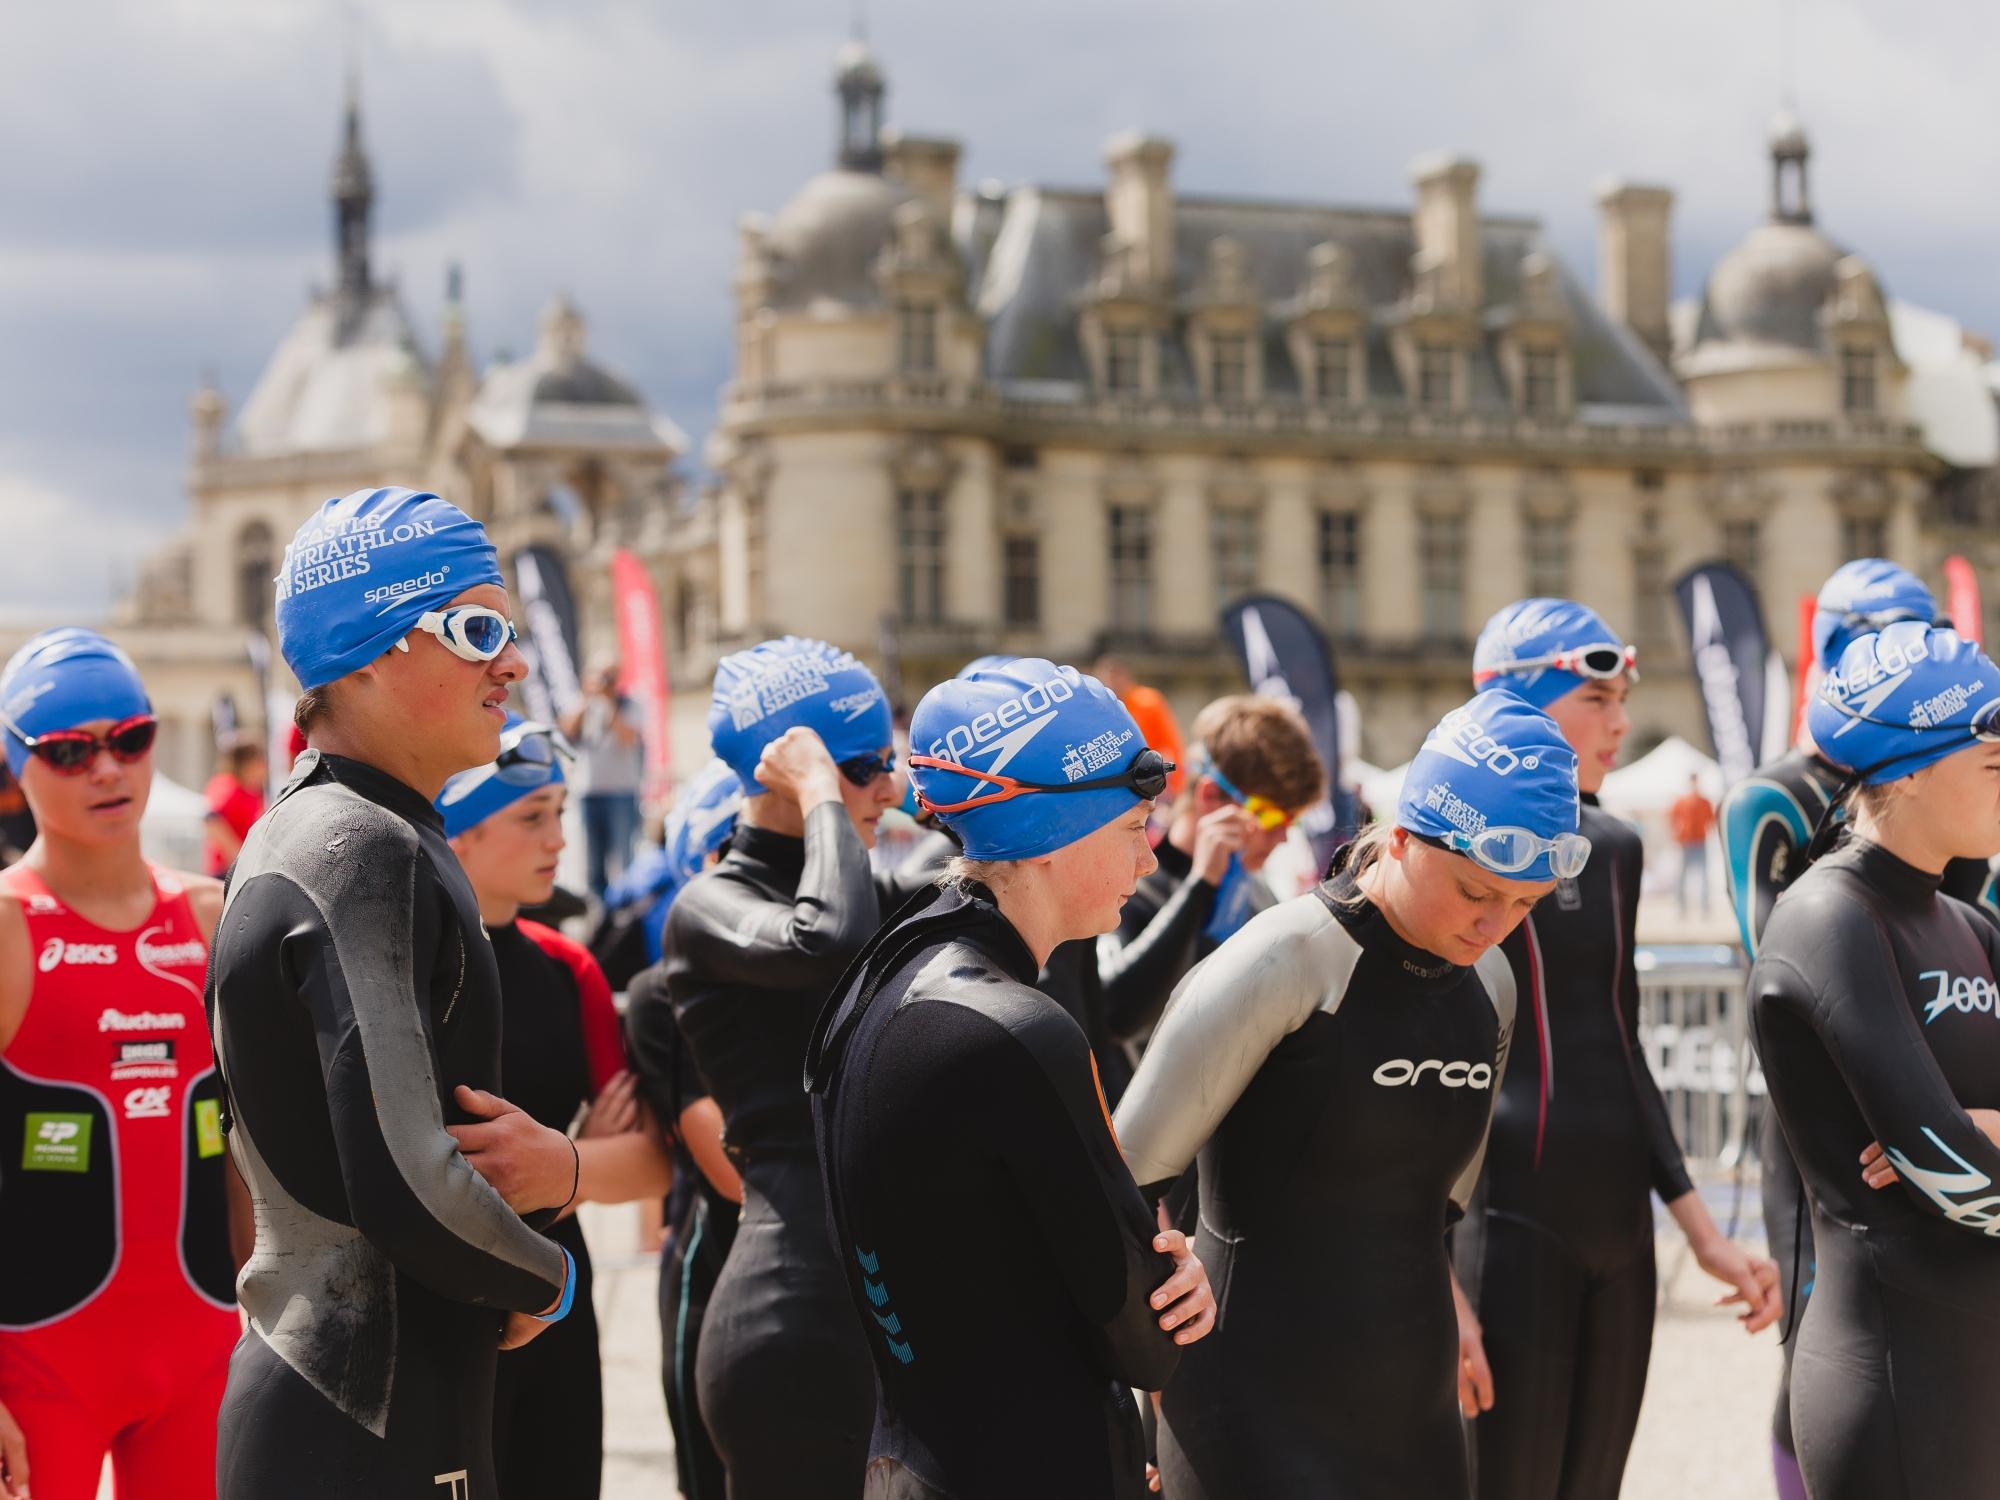 Triathlon Chantilly 2014 review, chantilly triathlon review, chantilly triathlon 2015, chantilly triathlon course, chantilly triathlon difficult, chantilly triathlon transport from uk